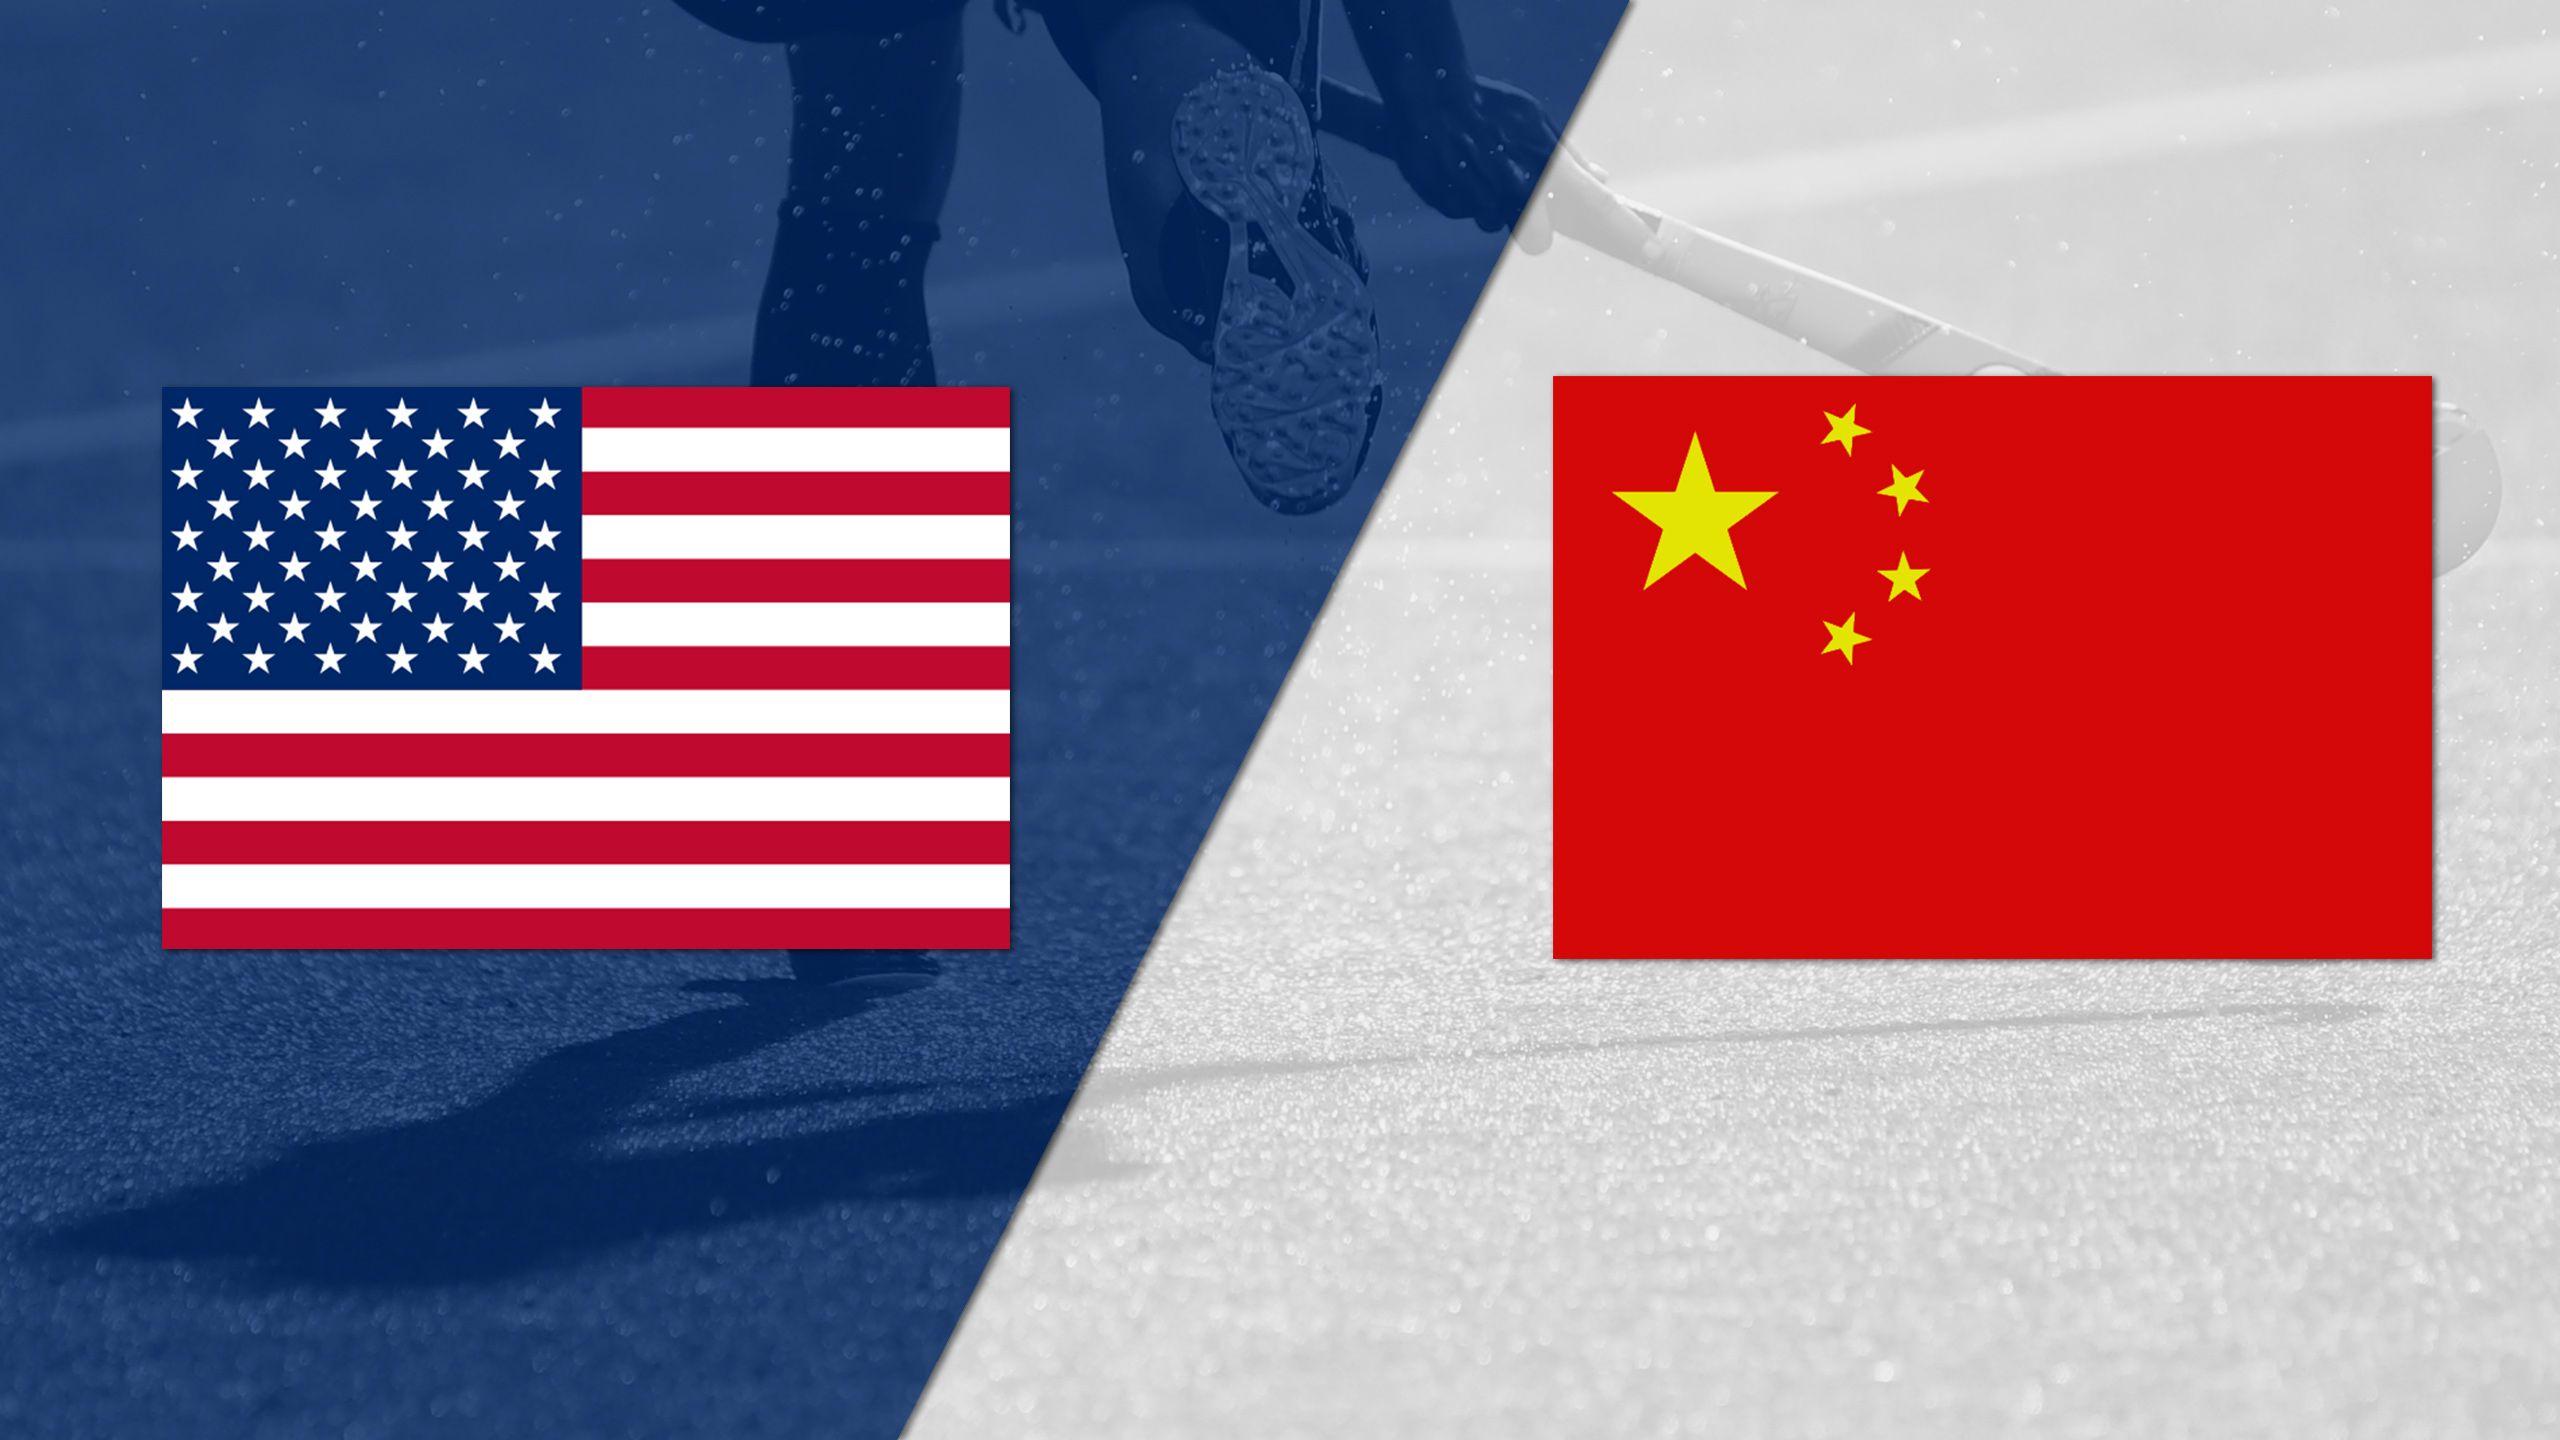 United States vs. China (Women's FIH World League)